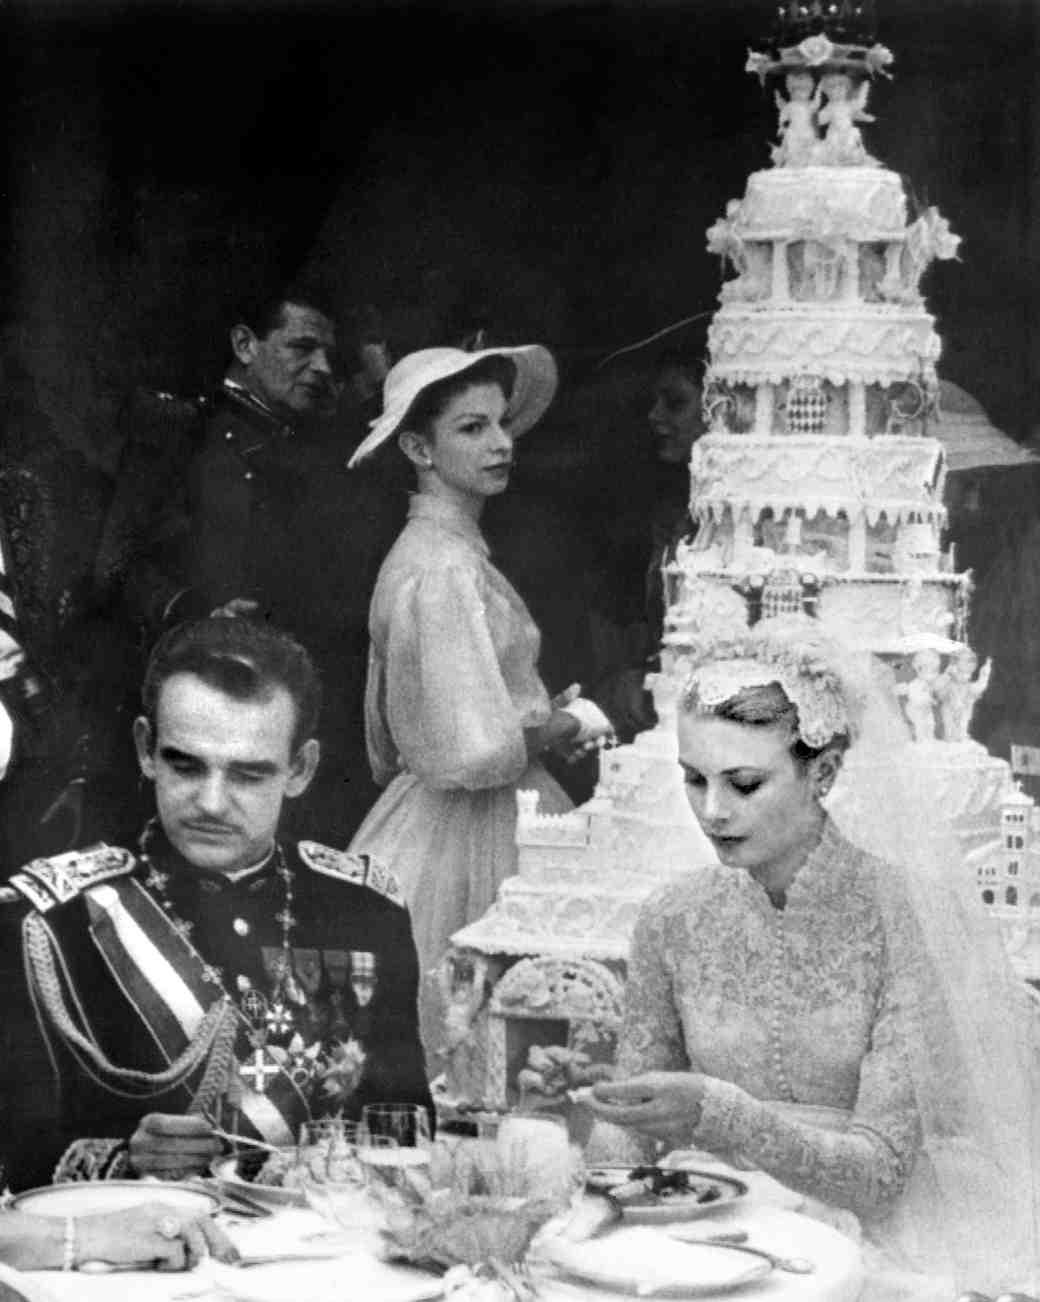 celebrity-vintage-wedding-cakes-grace-kelly-111652580-1015.jpg